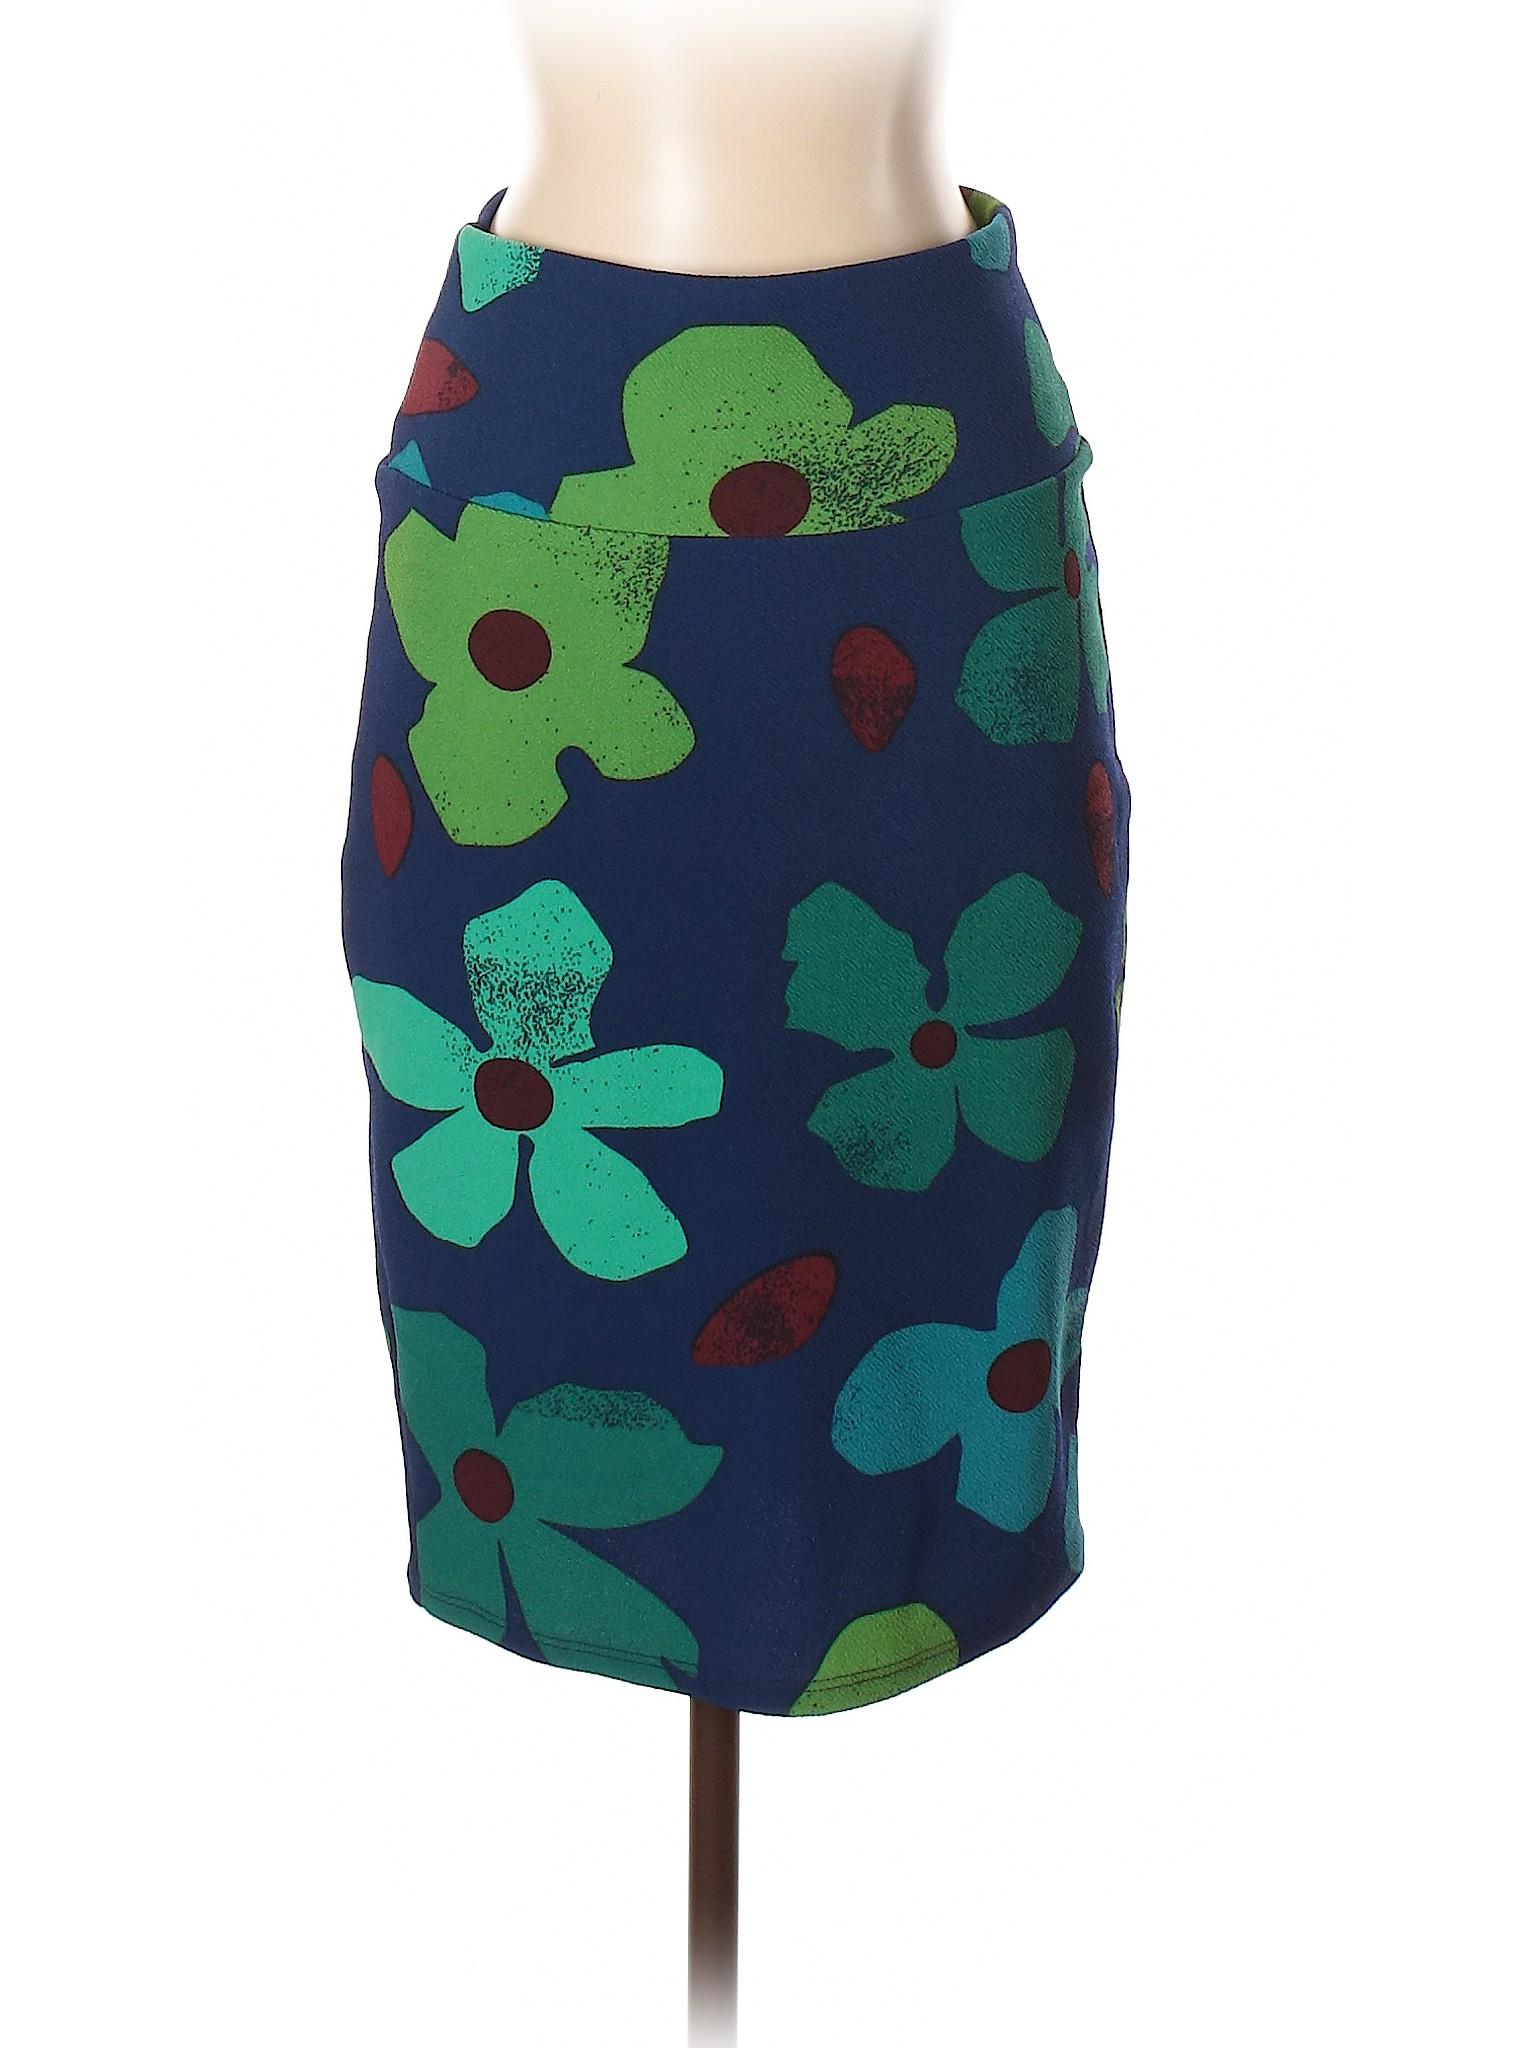 Leisure winter Casual Lularoe Leisure Lularoe Casual Skirt Skirt winter winter Leisure Lularoe Casual Pw1CYqq5